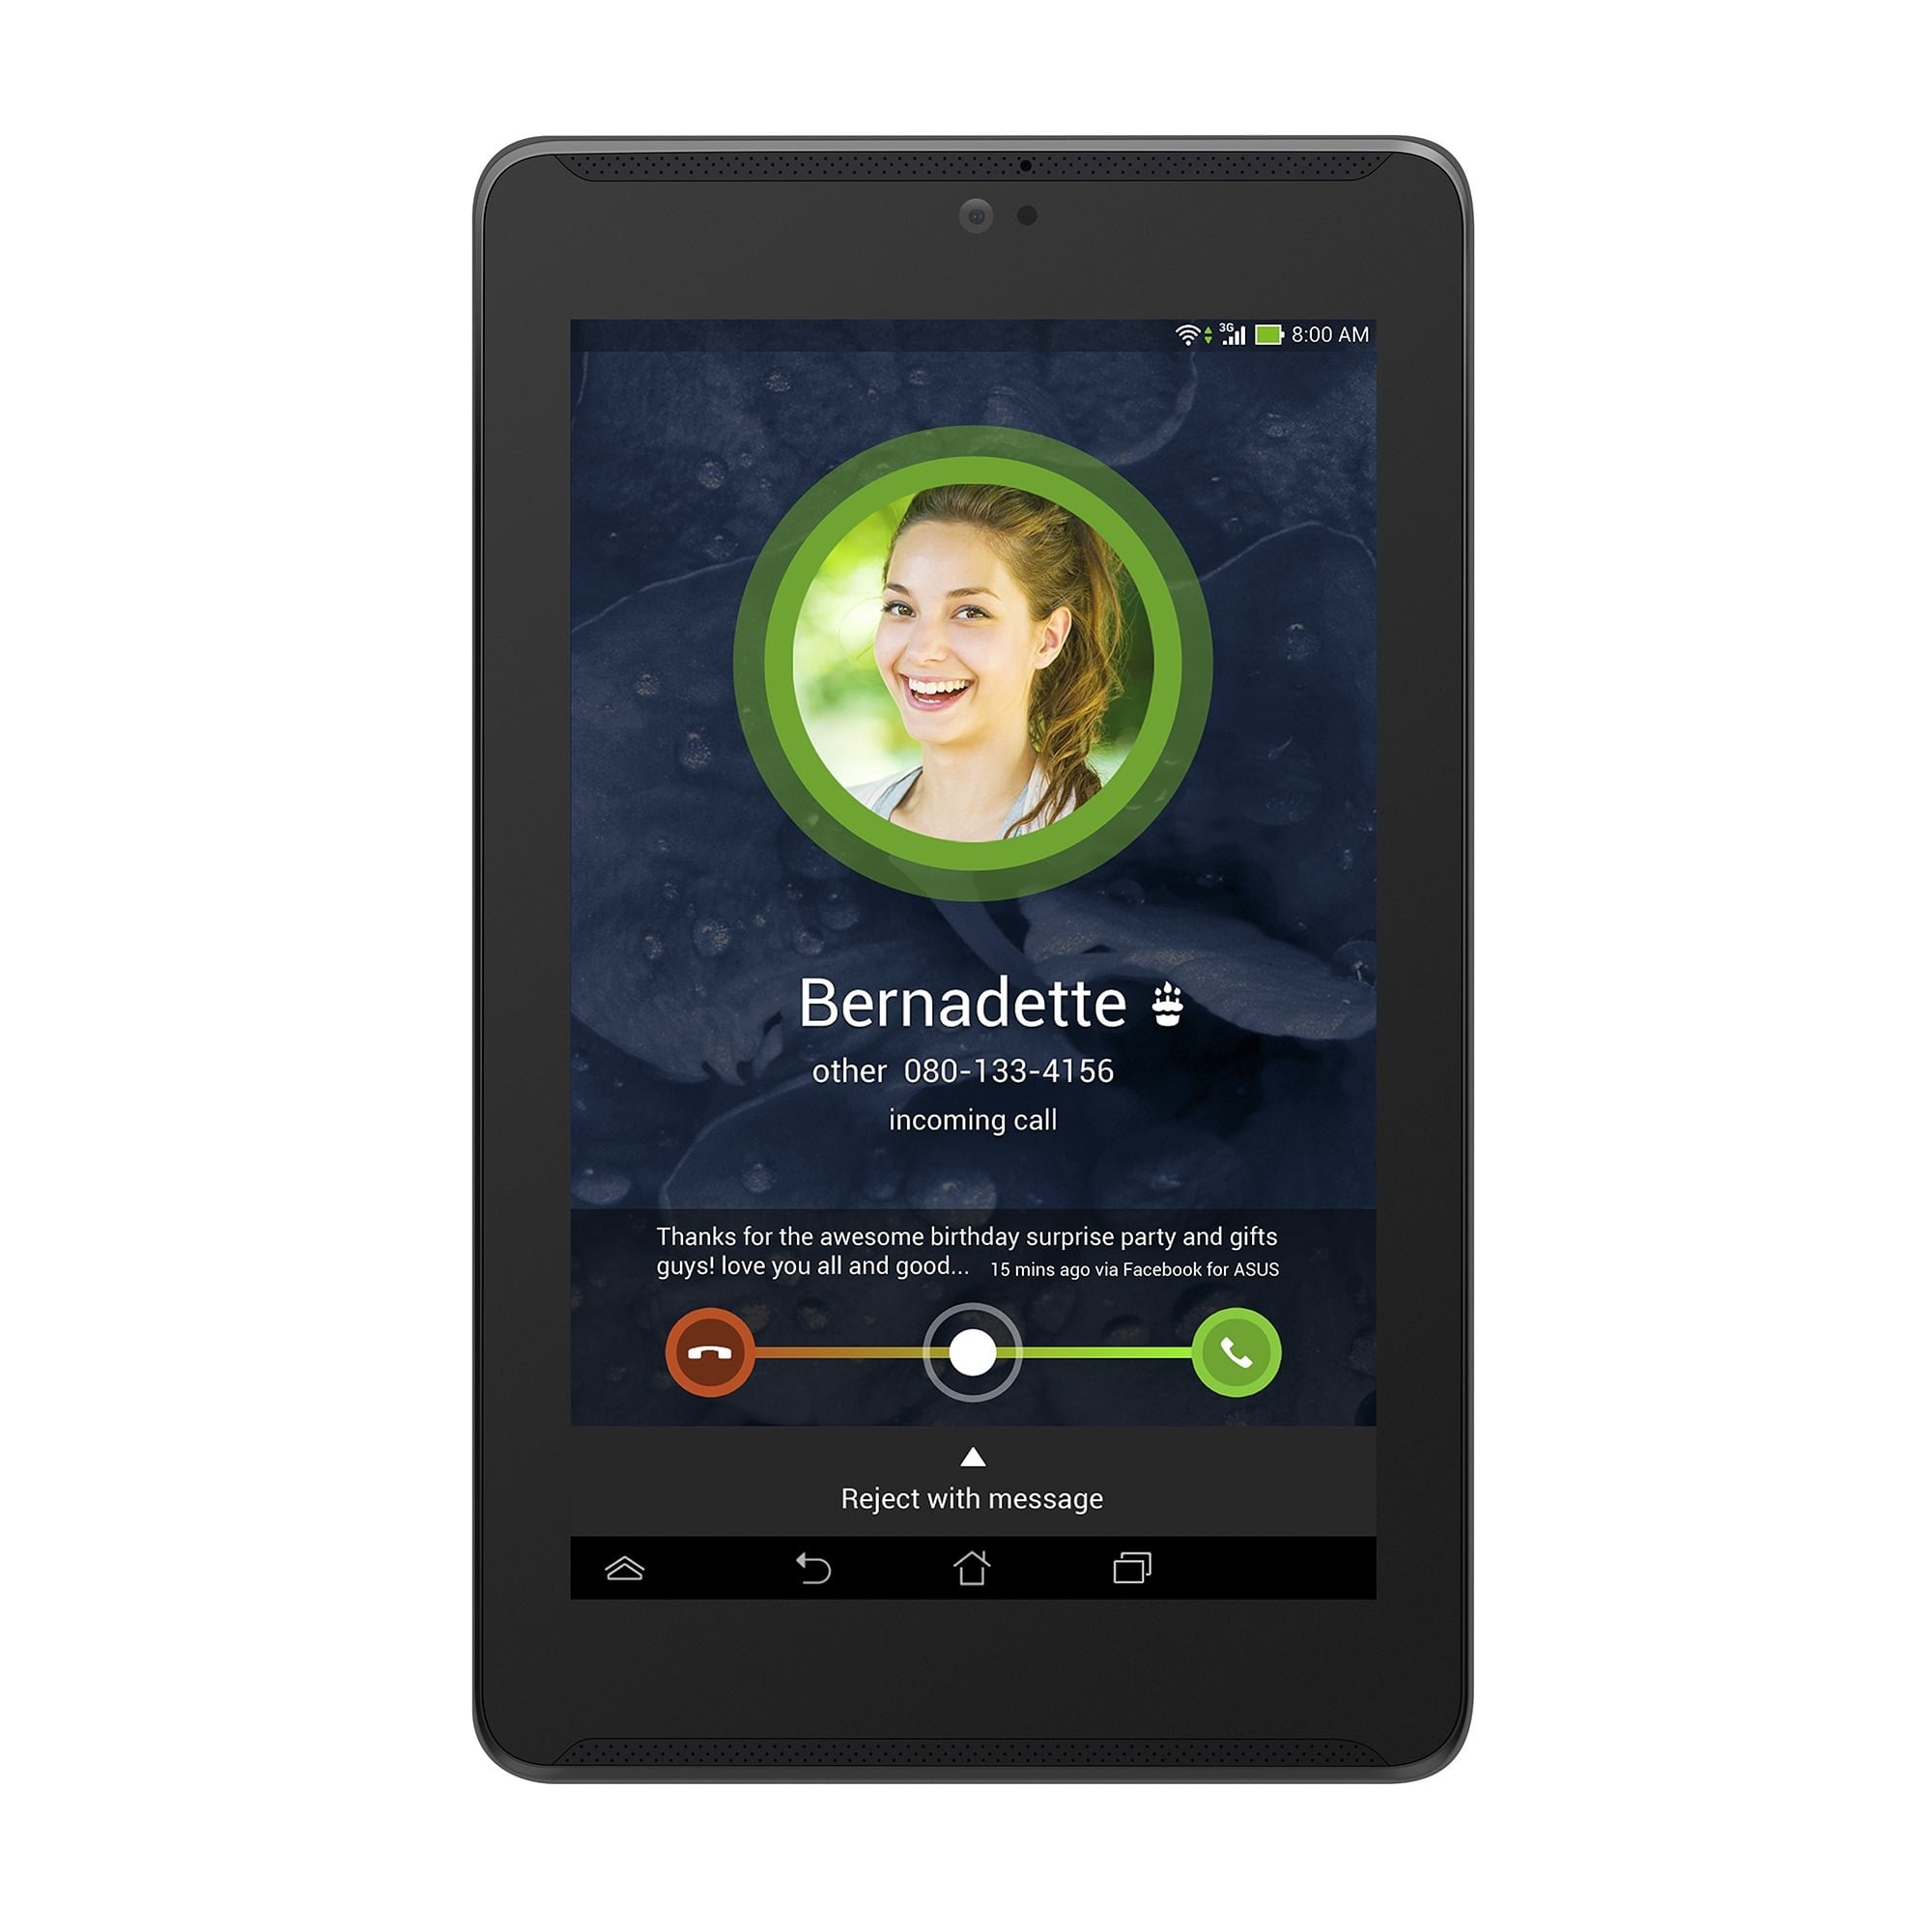 Tabletin Telefon Özelliğini Açma tabletin telefon özelliğini açma tabletin telefon özelliğini açma res 6cabf410a5c0c683e5a609e7b65b46b1